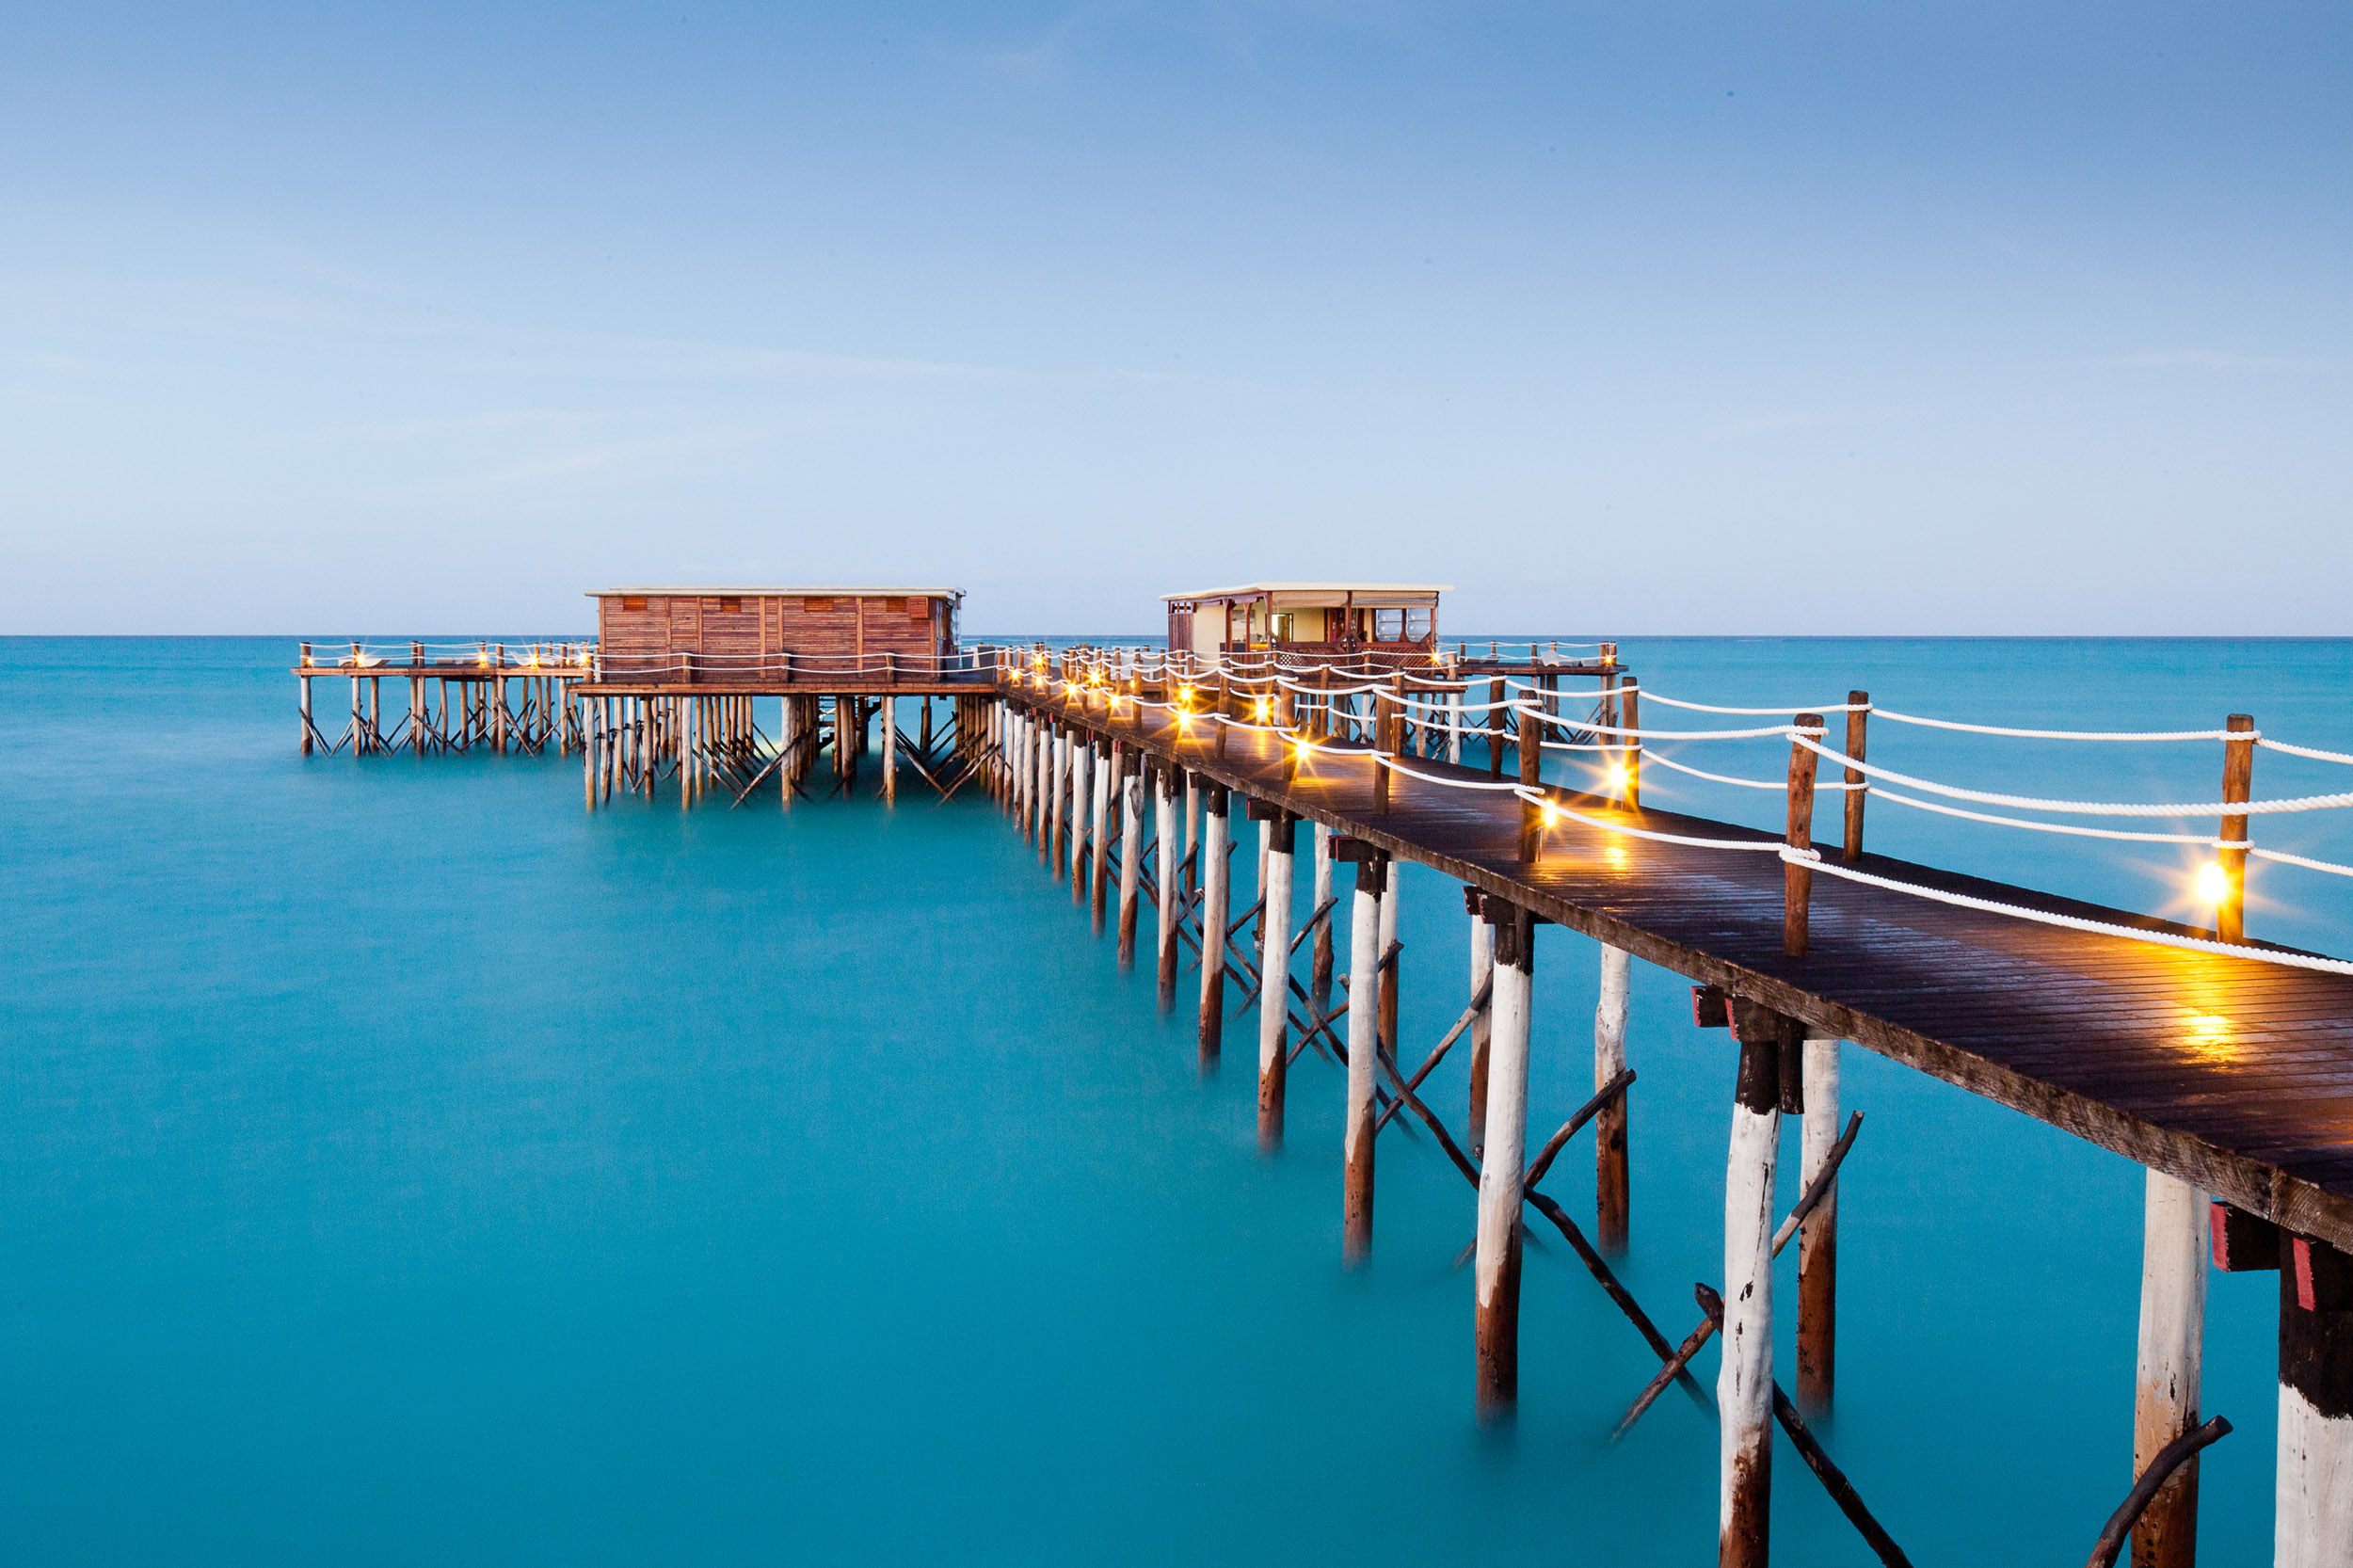 A long light-strung boardwalk jetty in the ocean at Essque Zalu Zanzibar